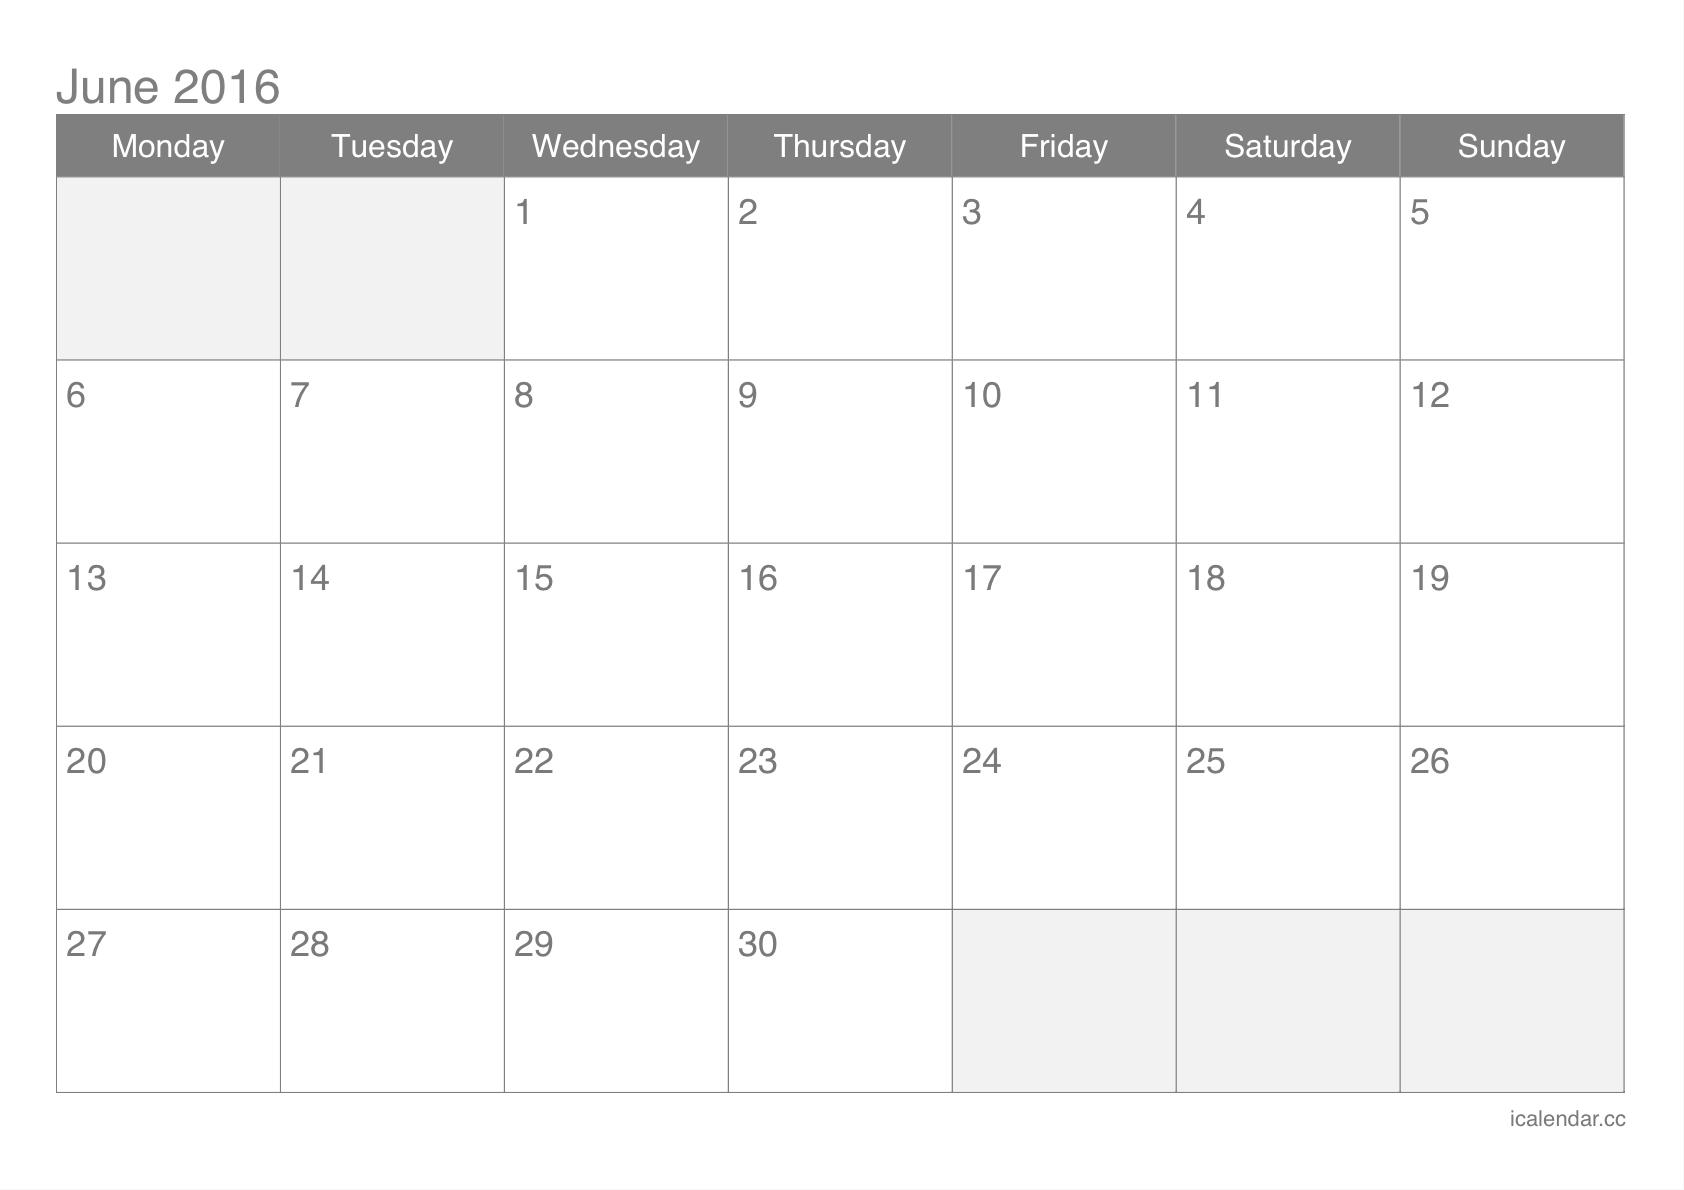 June 2016 Printable Calendar  Icalendars regarding June 2016 Calendar Printable